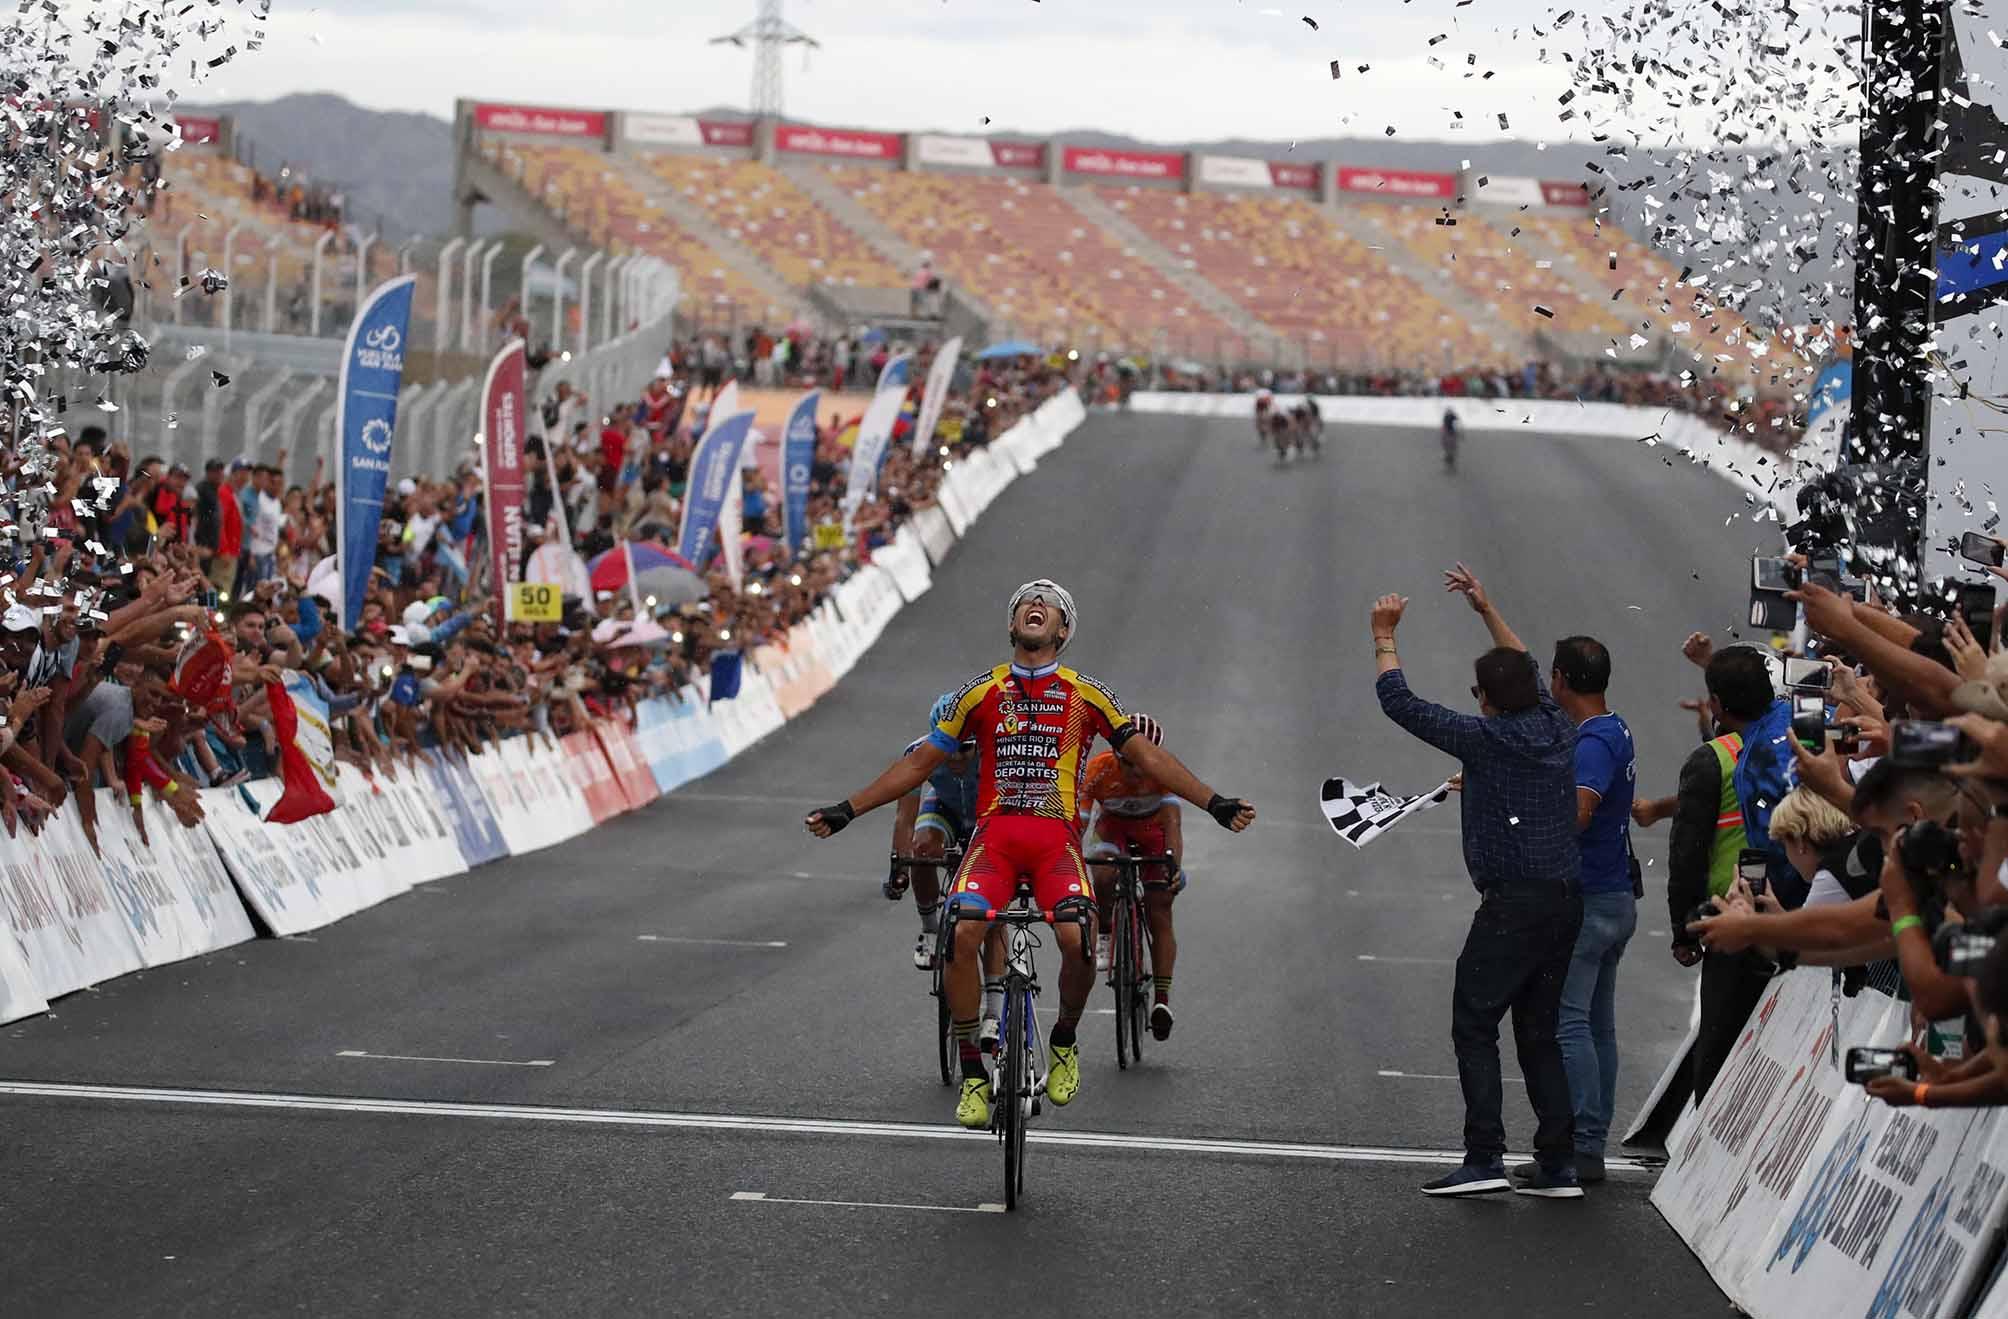 German Tivani vince la sesta tappa della Vuelta a San Juan 2019